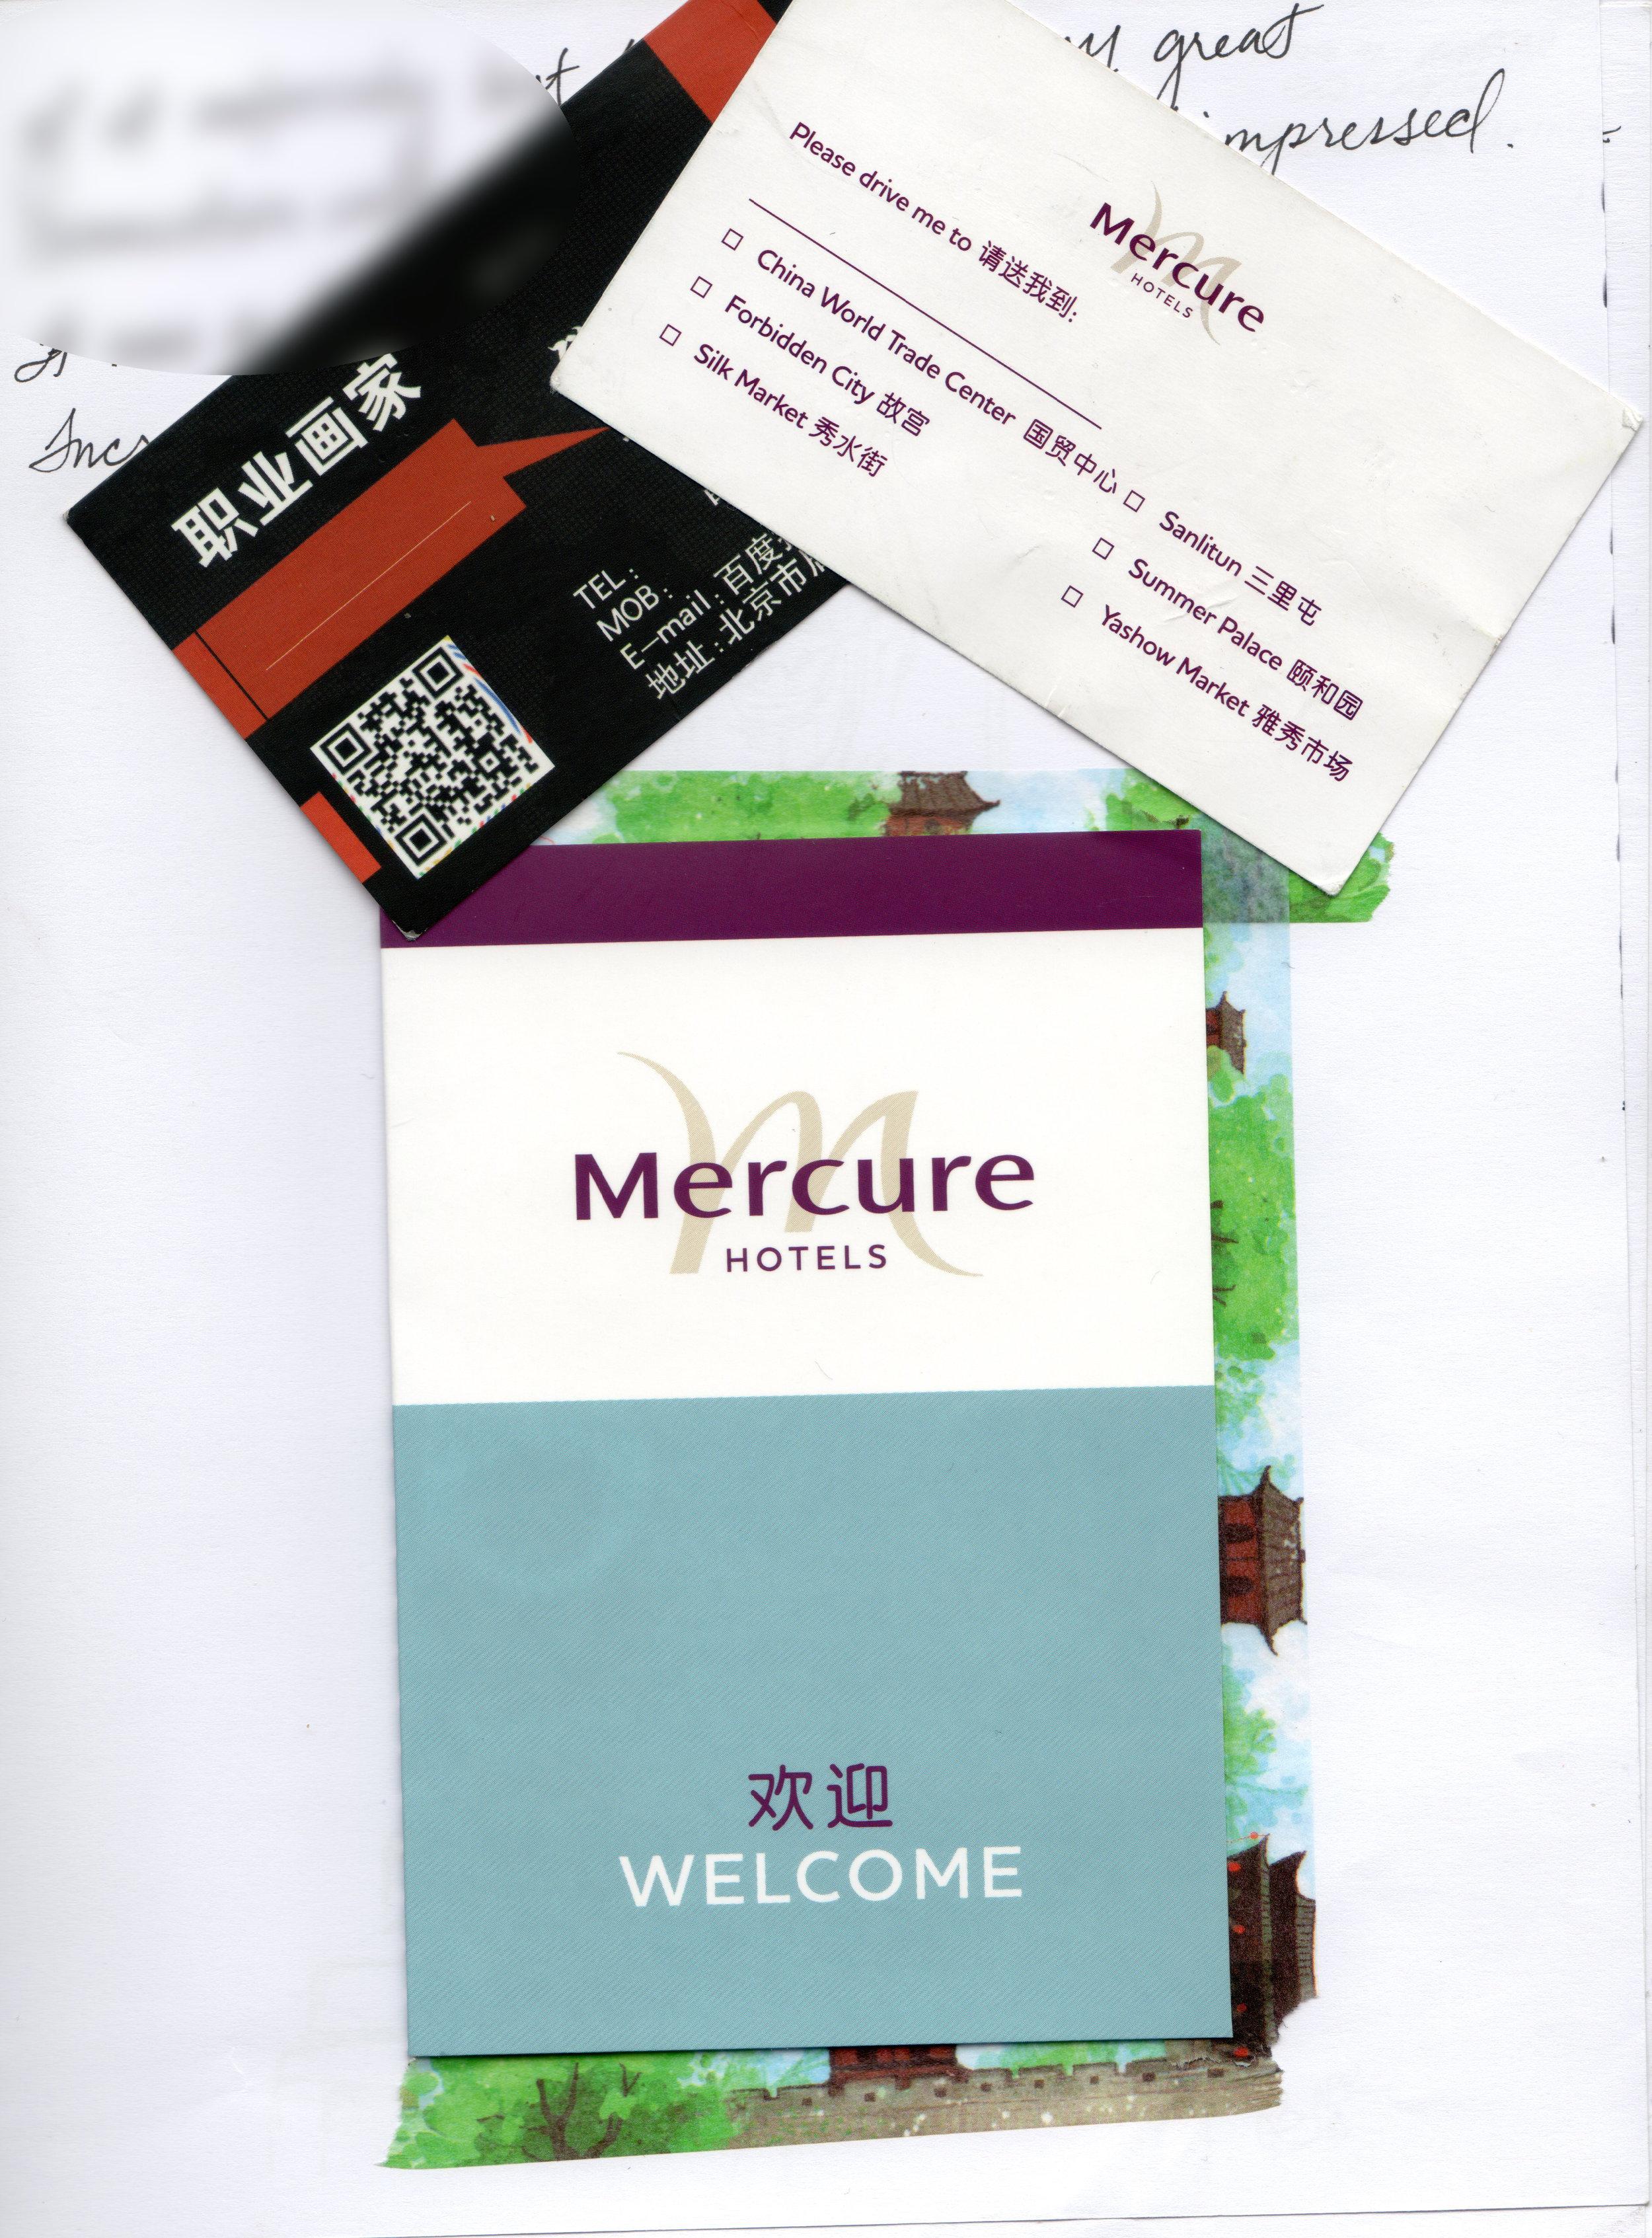 China 2018 Tickets 2.jpg